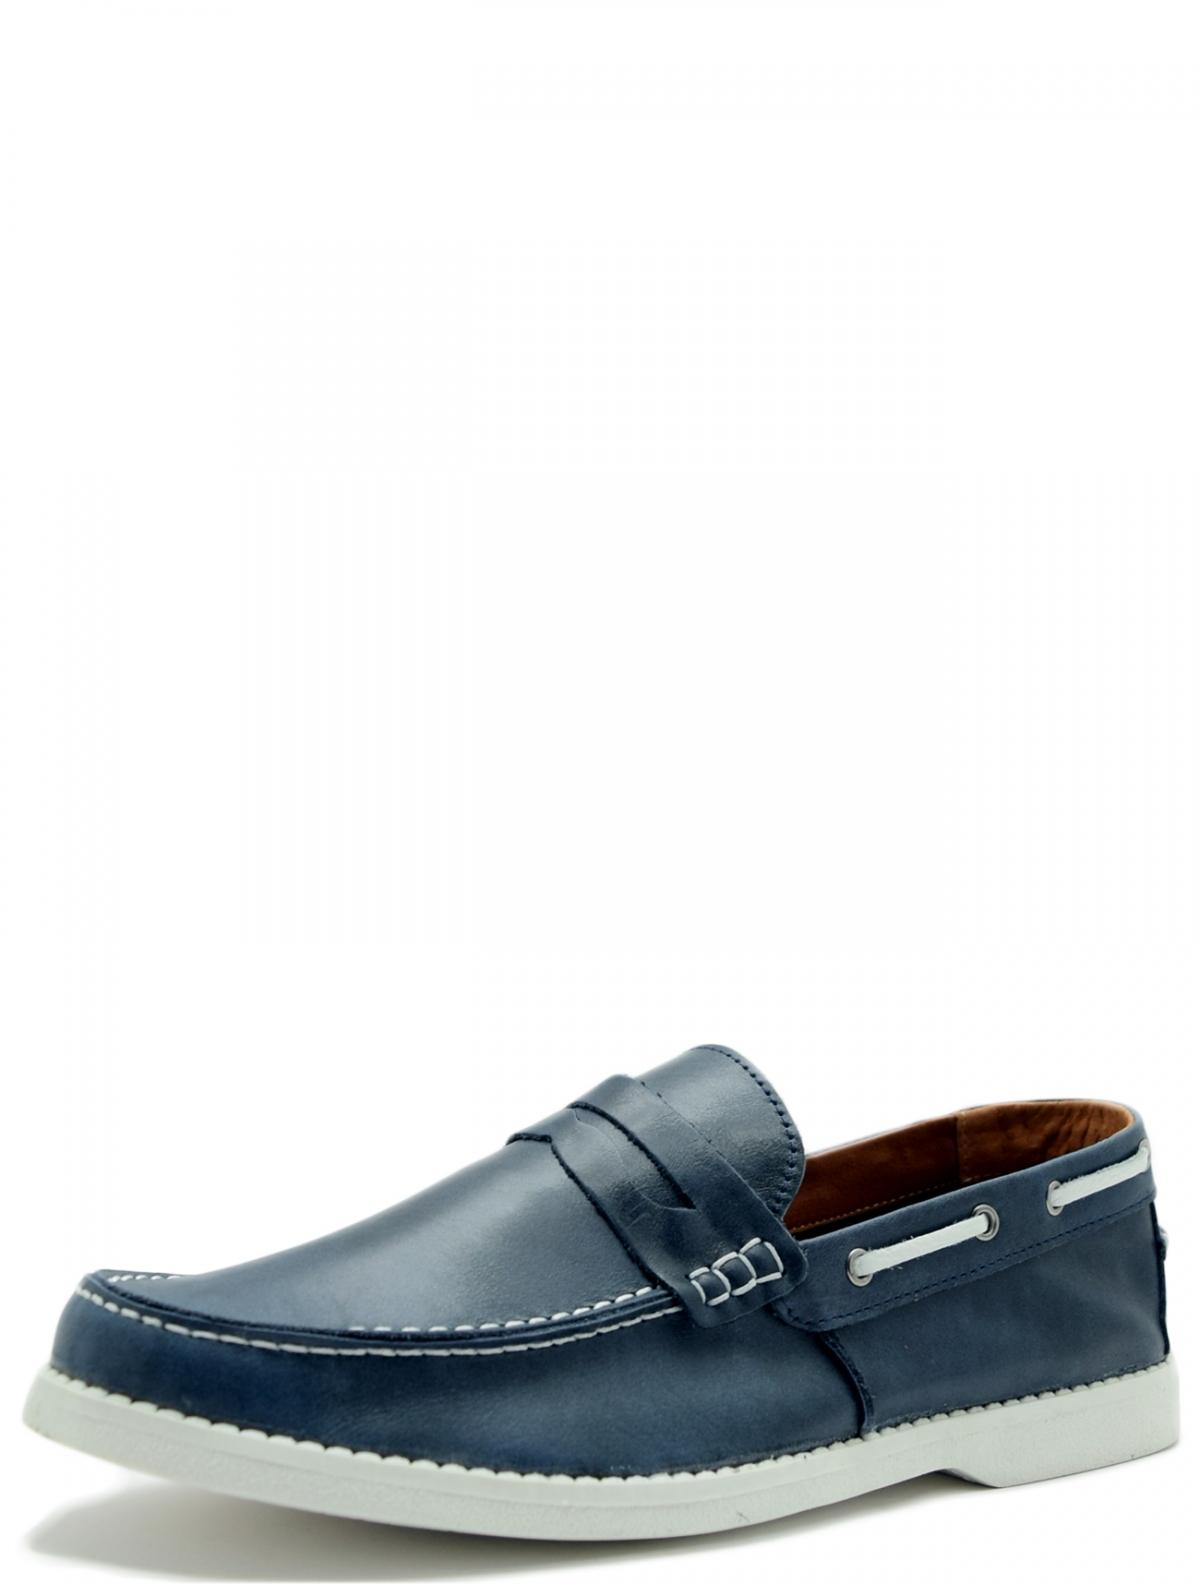 Rooman 300-167-S3L мужские туфли